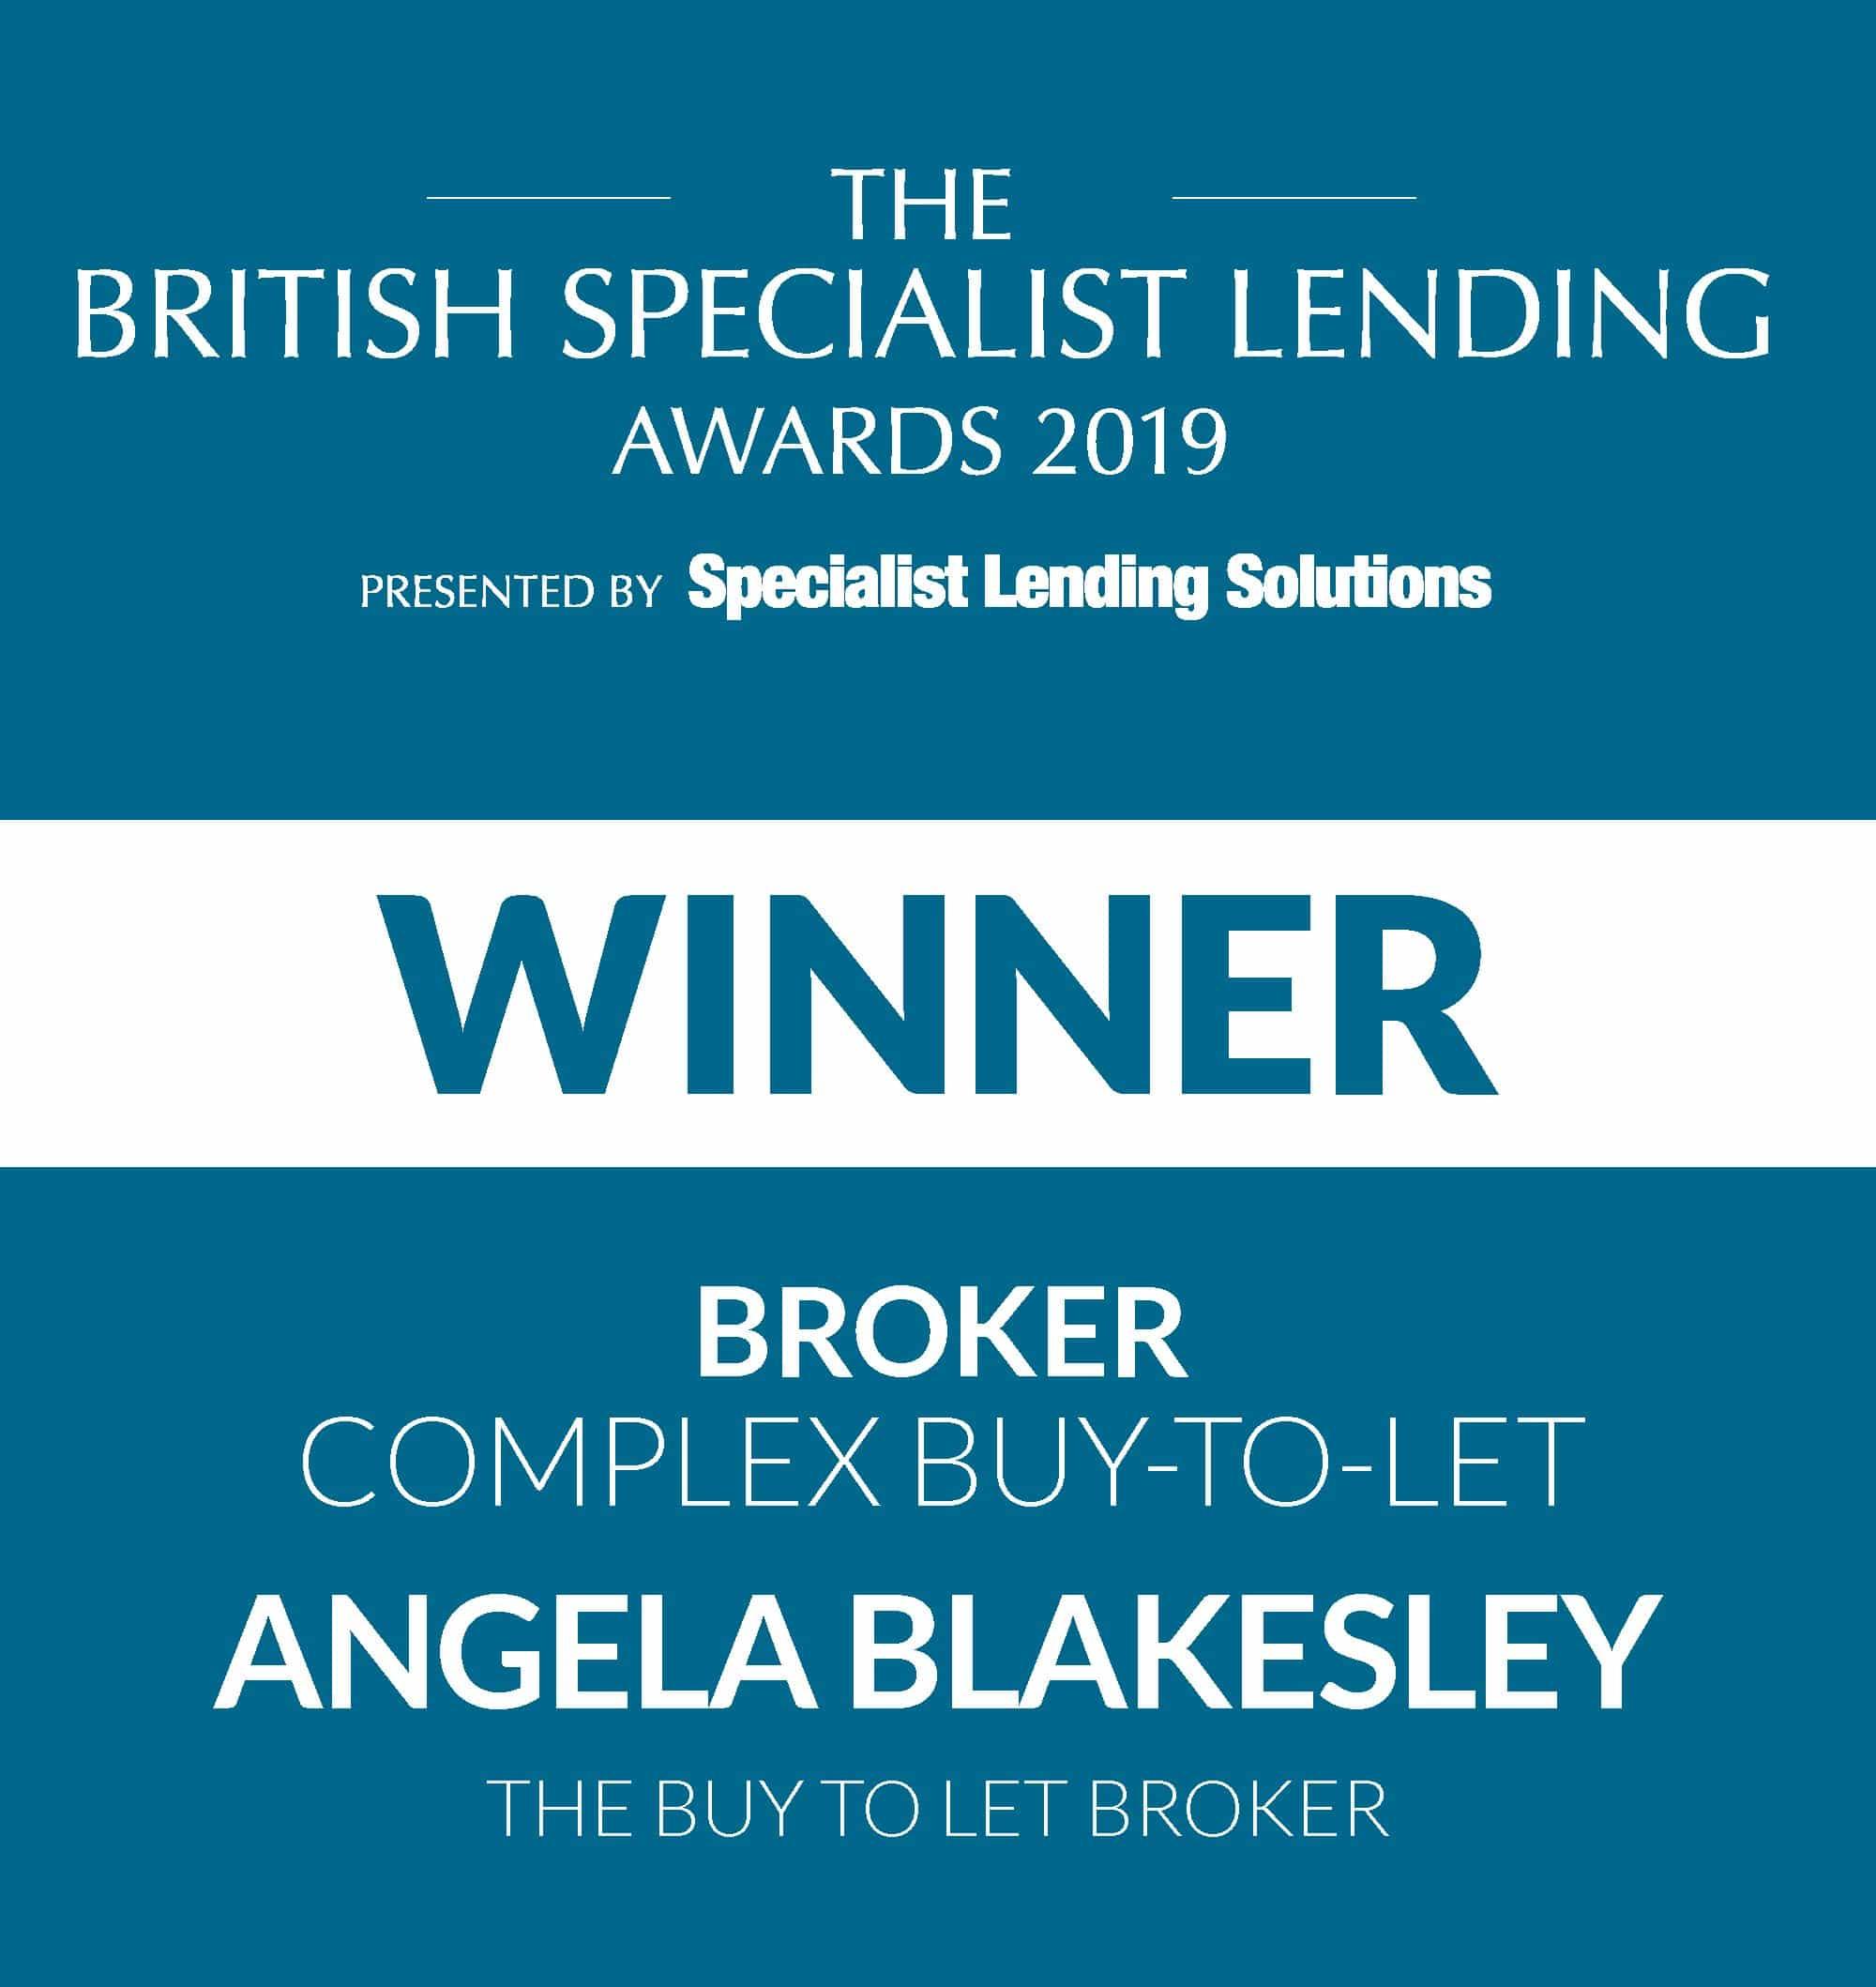 The British Specialist Lending Awards winner Angela Blakesley